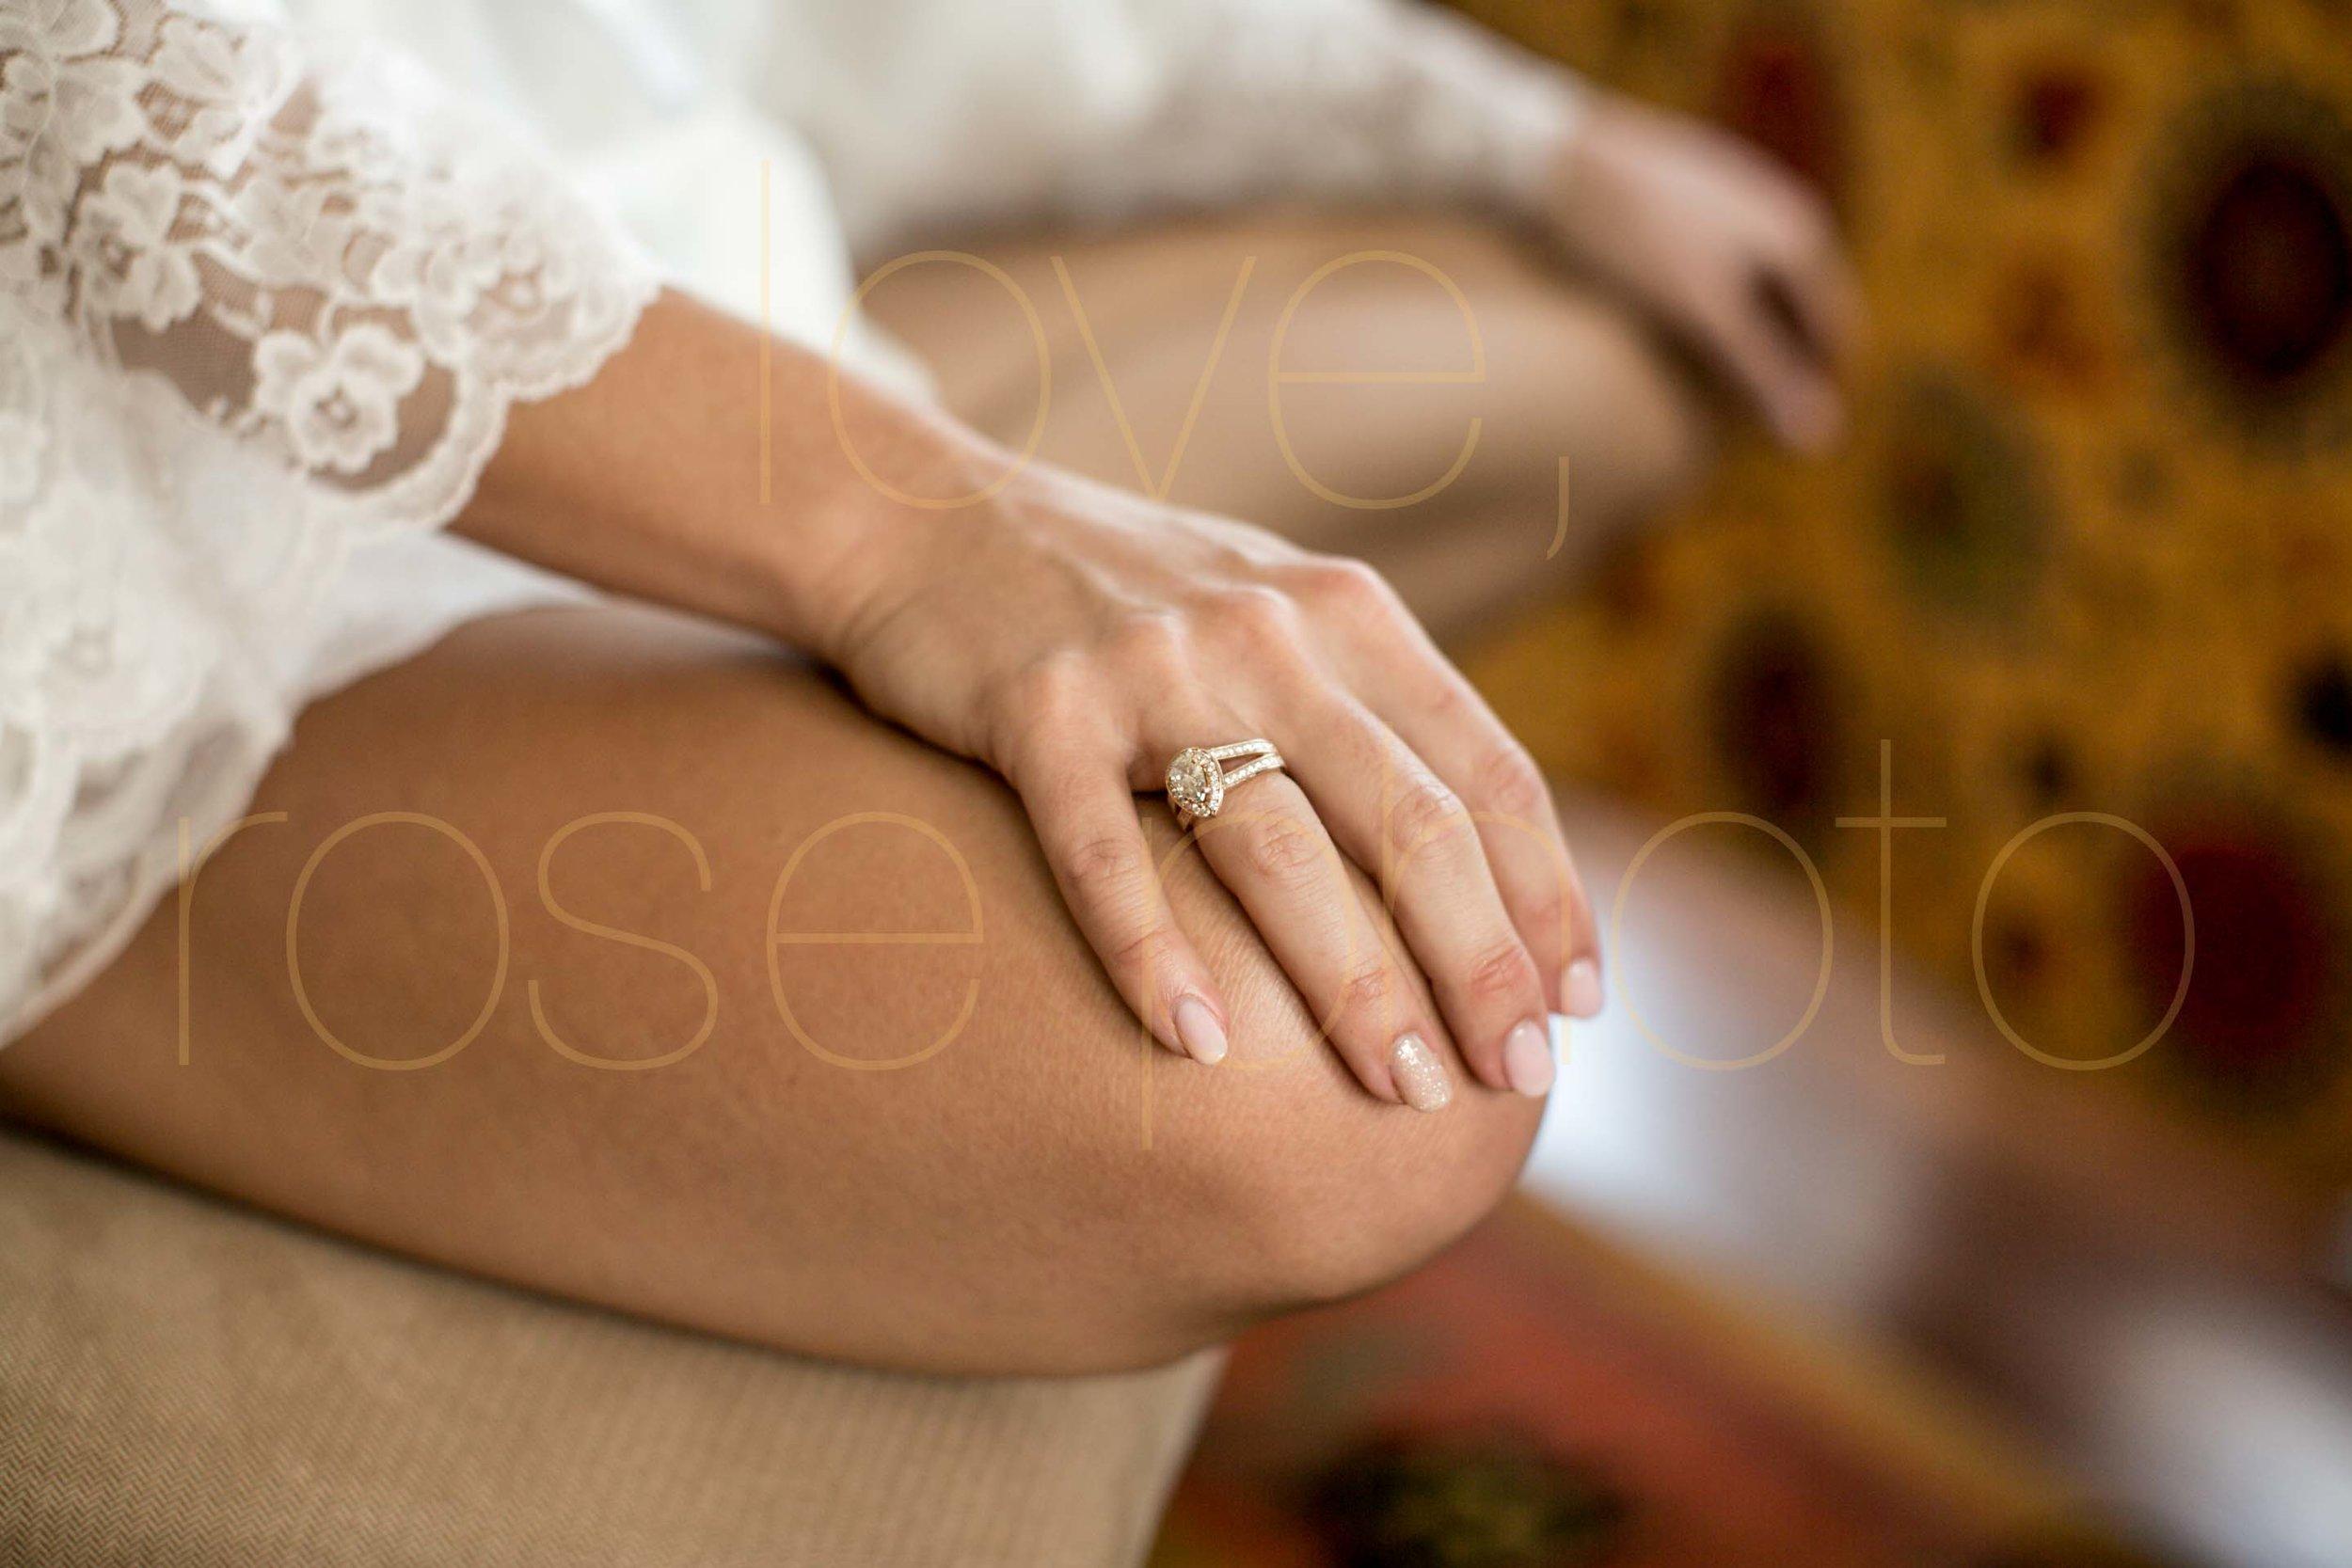 Rose Photo Asheville Wedding Photographer Nasheville Weddings Charleston Bride Chicago photojournalist weddings -12.jpg